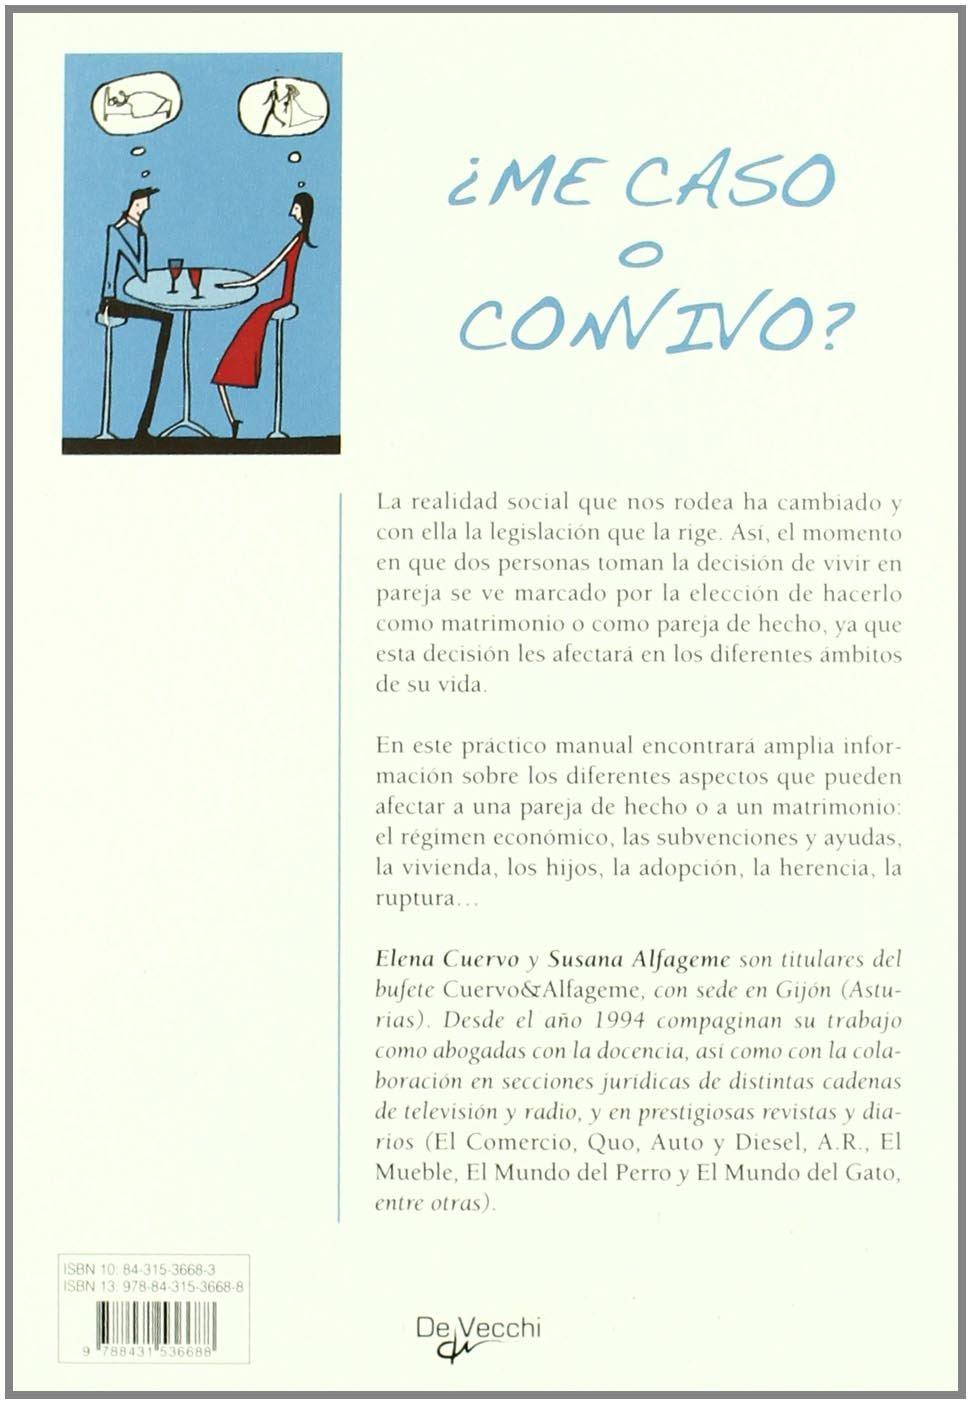 ?Me caso o convivo?: ELENA CUERVO : 9788431536688: Amazon.com: Books